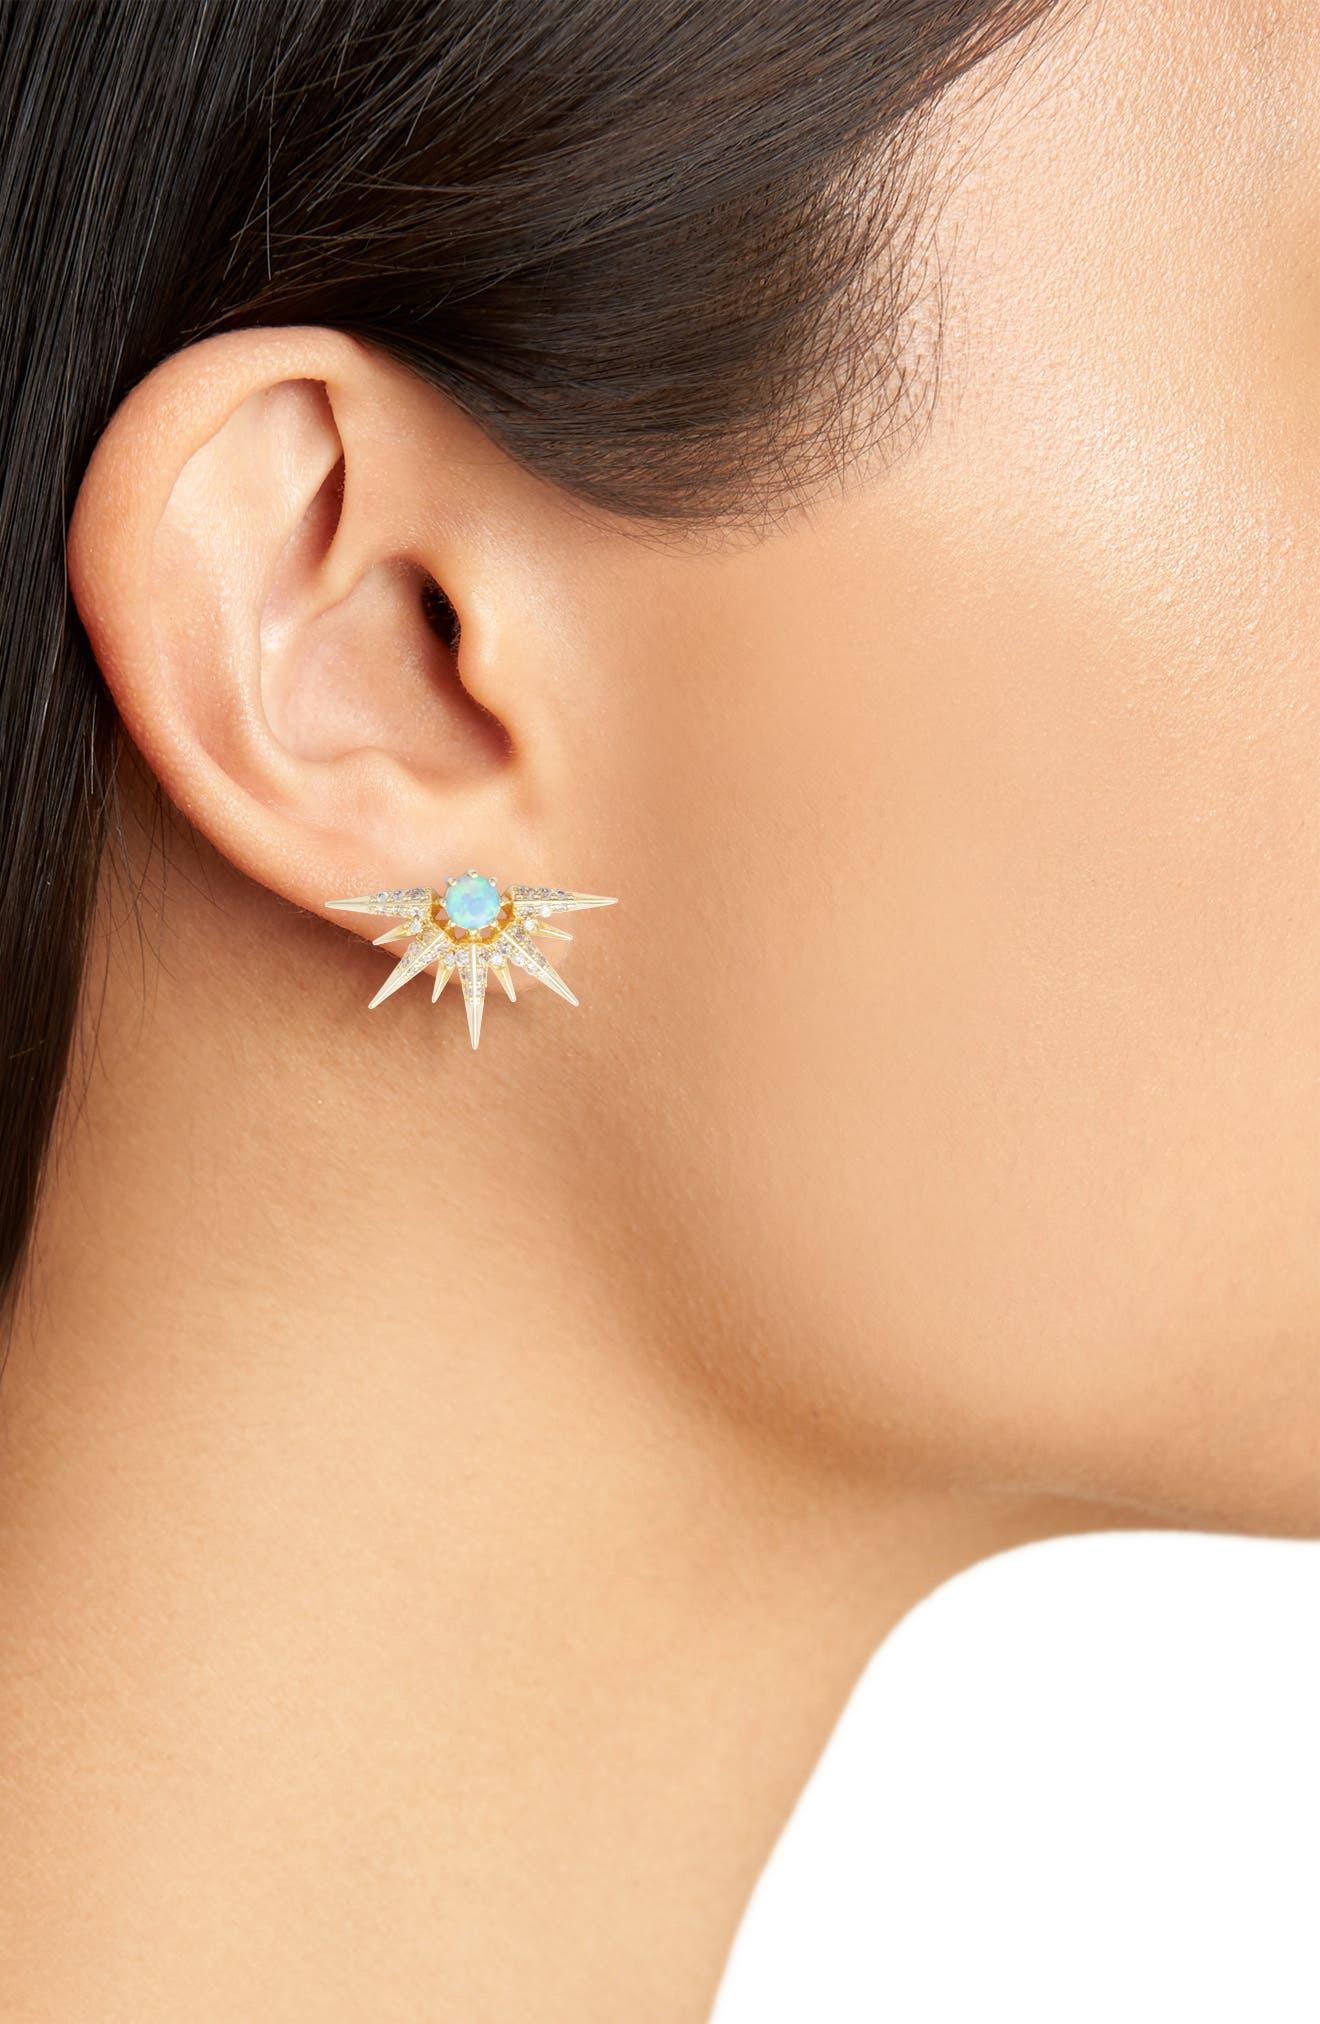 Barrie Earrings,                             Alternate thumbnail 2, color,                             Opal/ Crystal